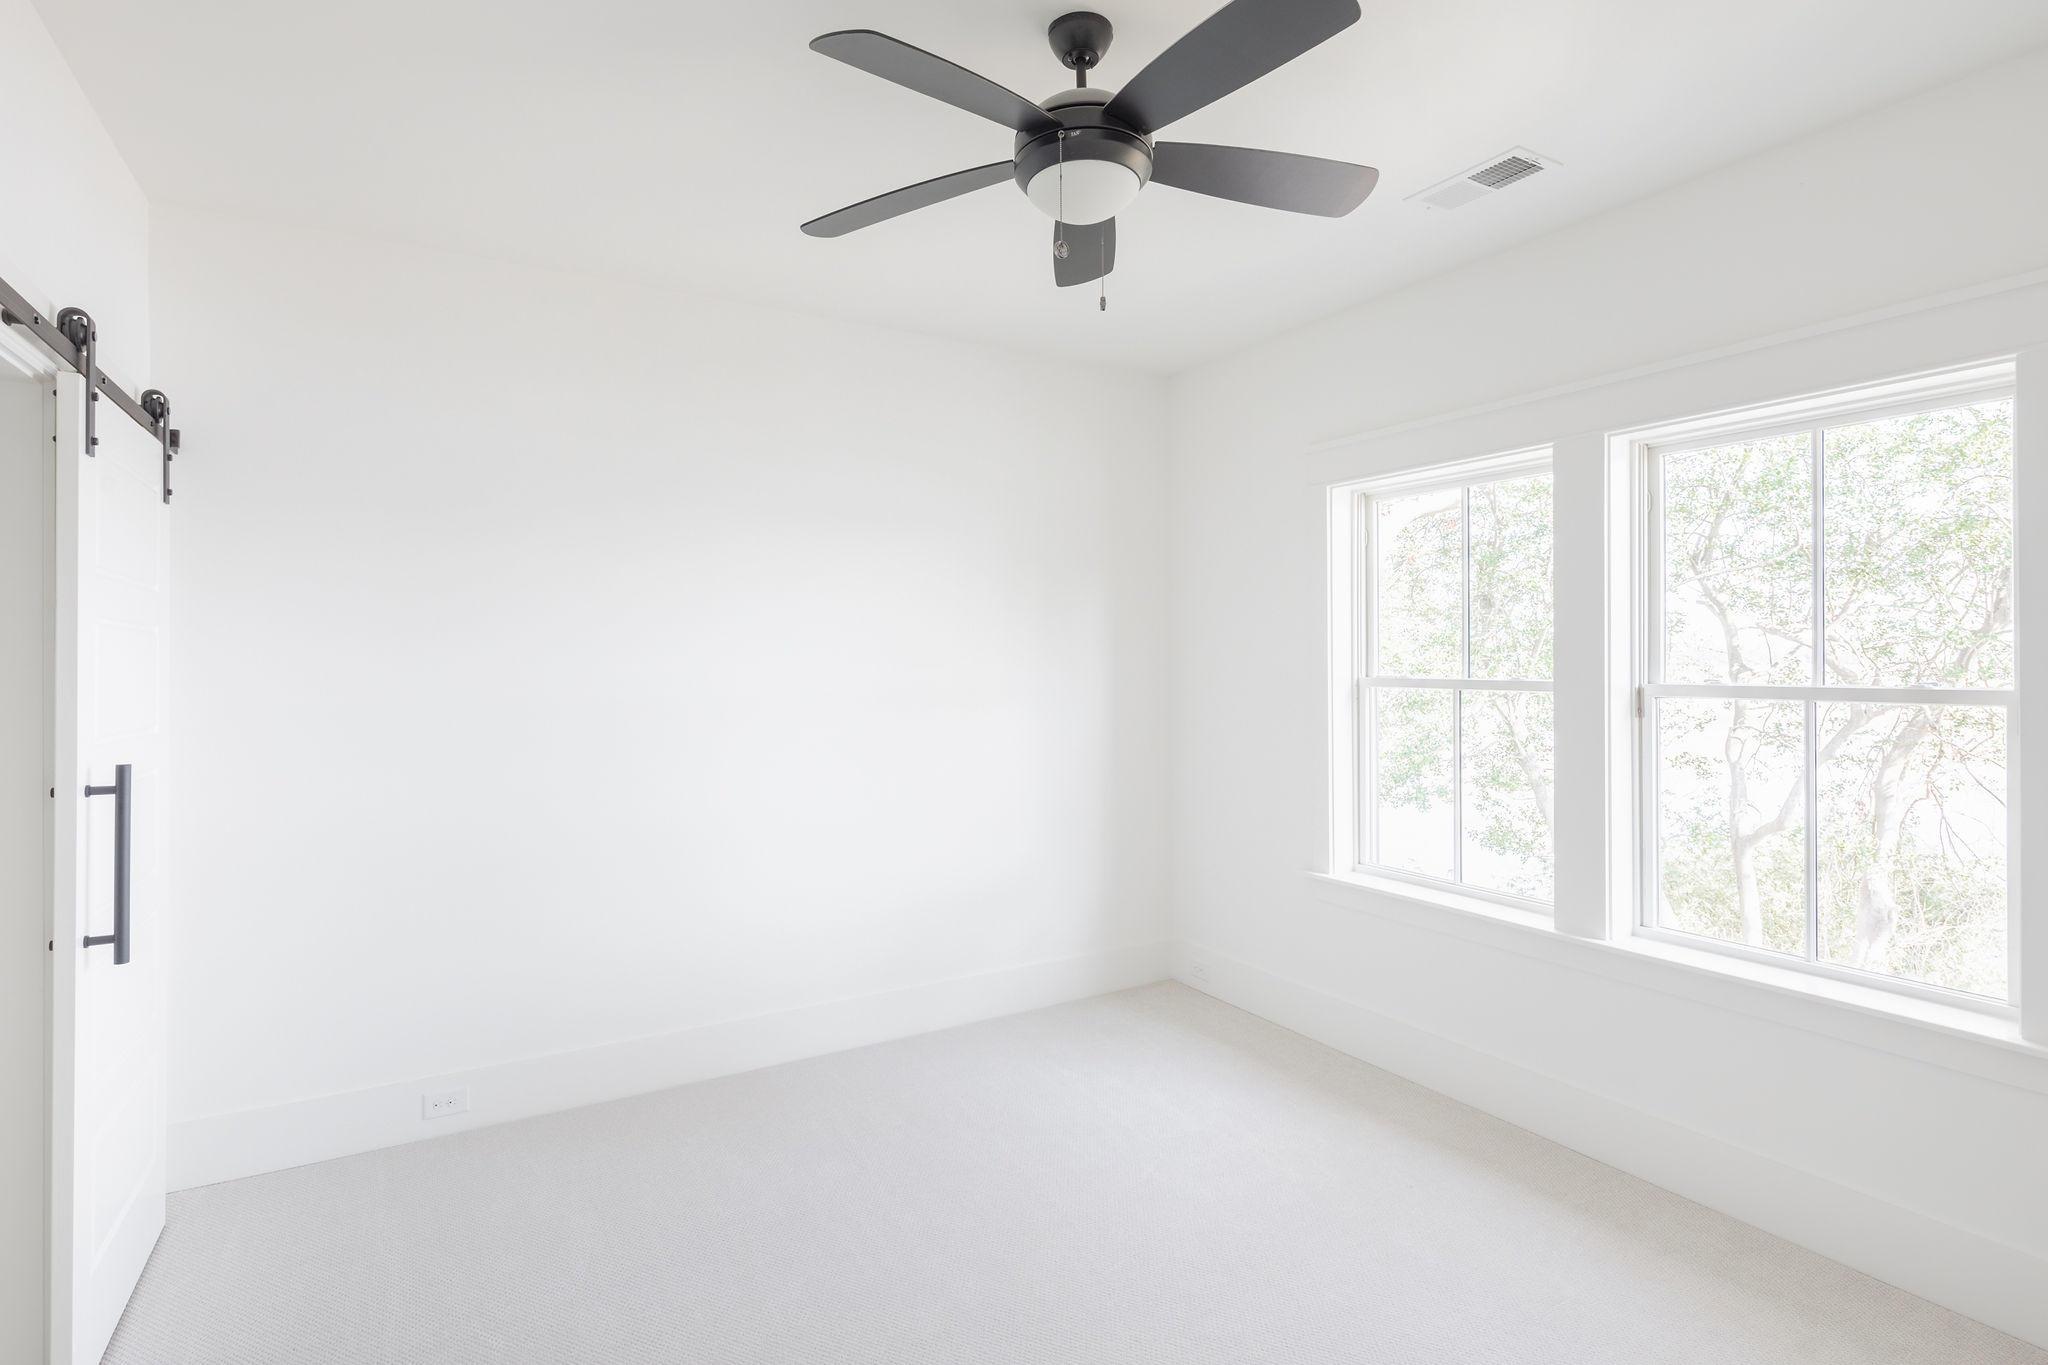 Park West Homes For Sale - 2292 Middlesex, Mount Pleasant, SC - 6